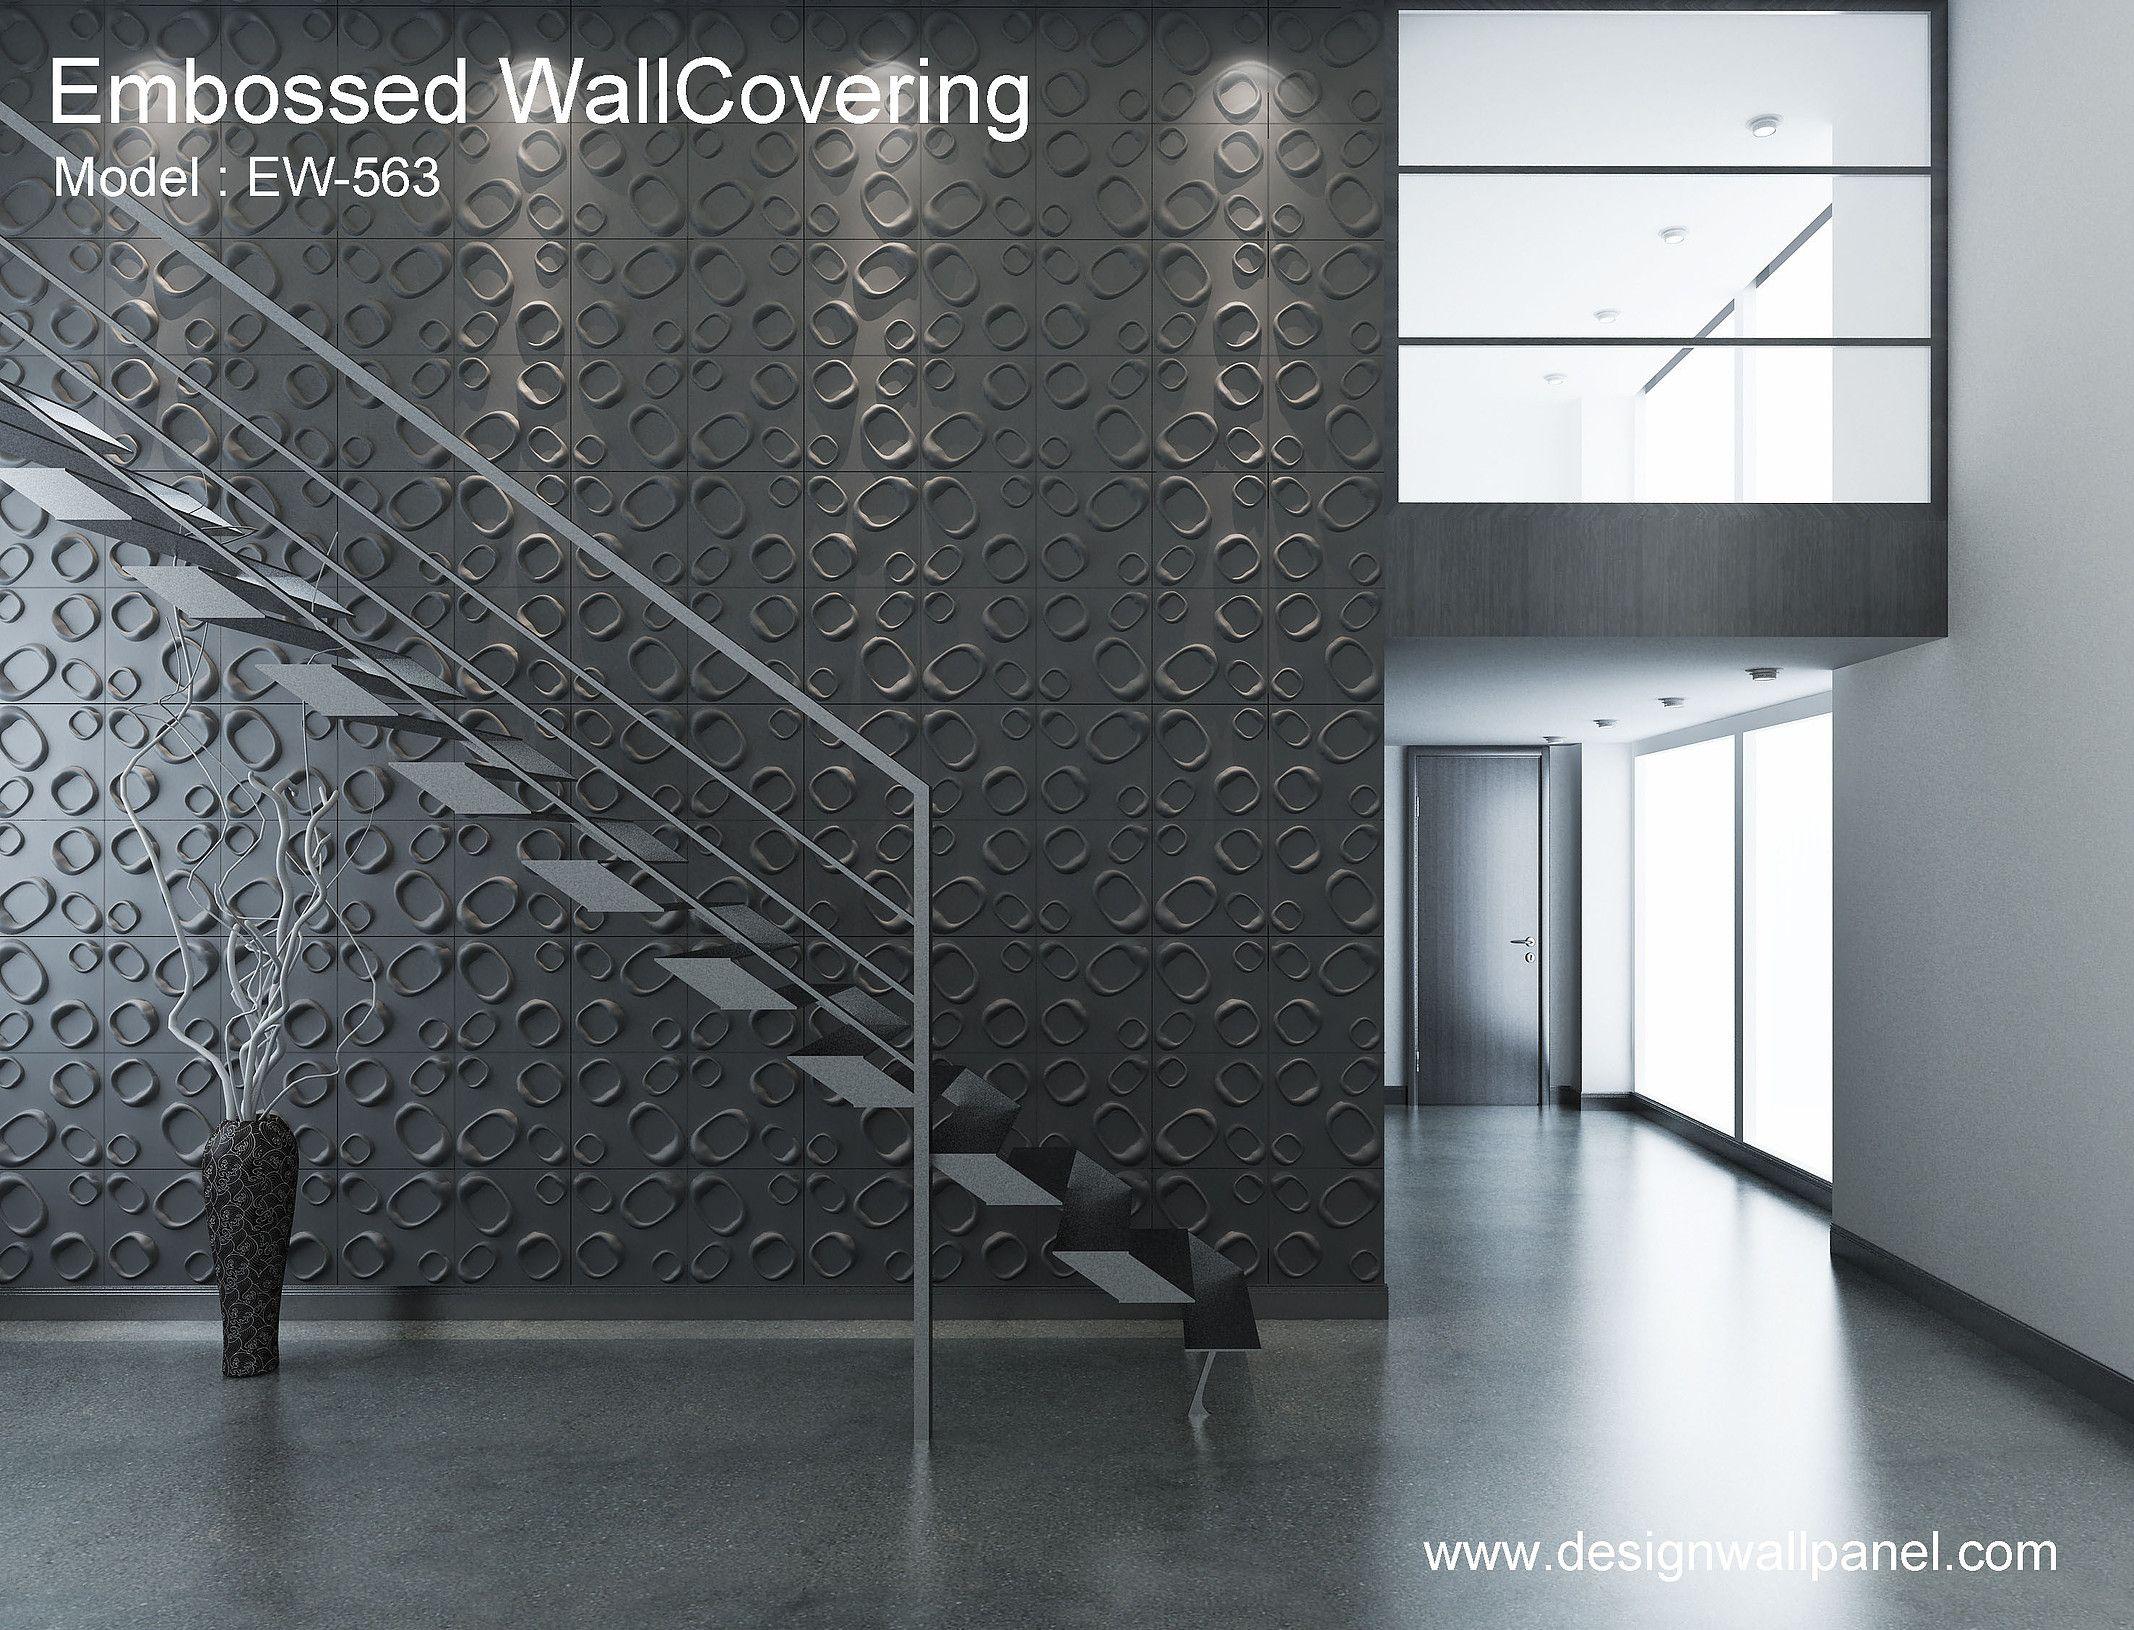 3d Wall Panel Singapore Wall Paneling 3d Wall Panels Wall Design